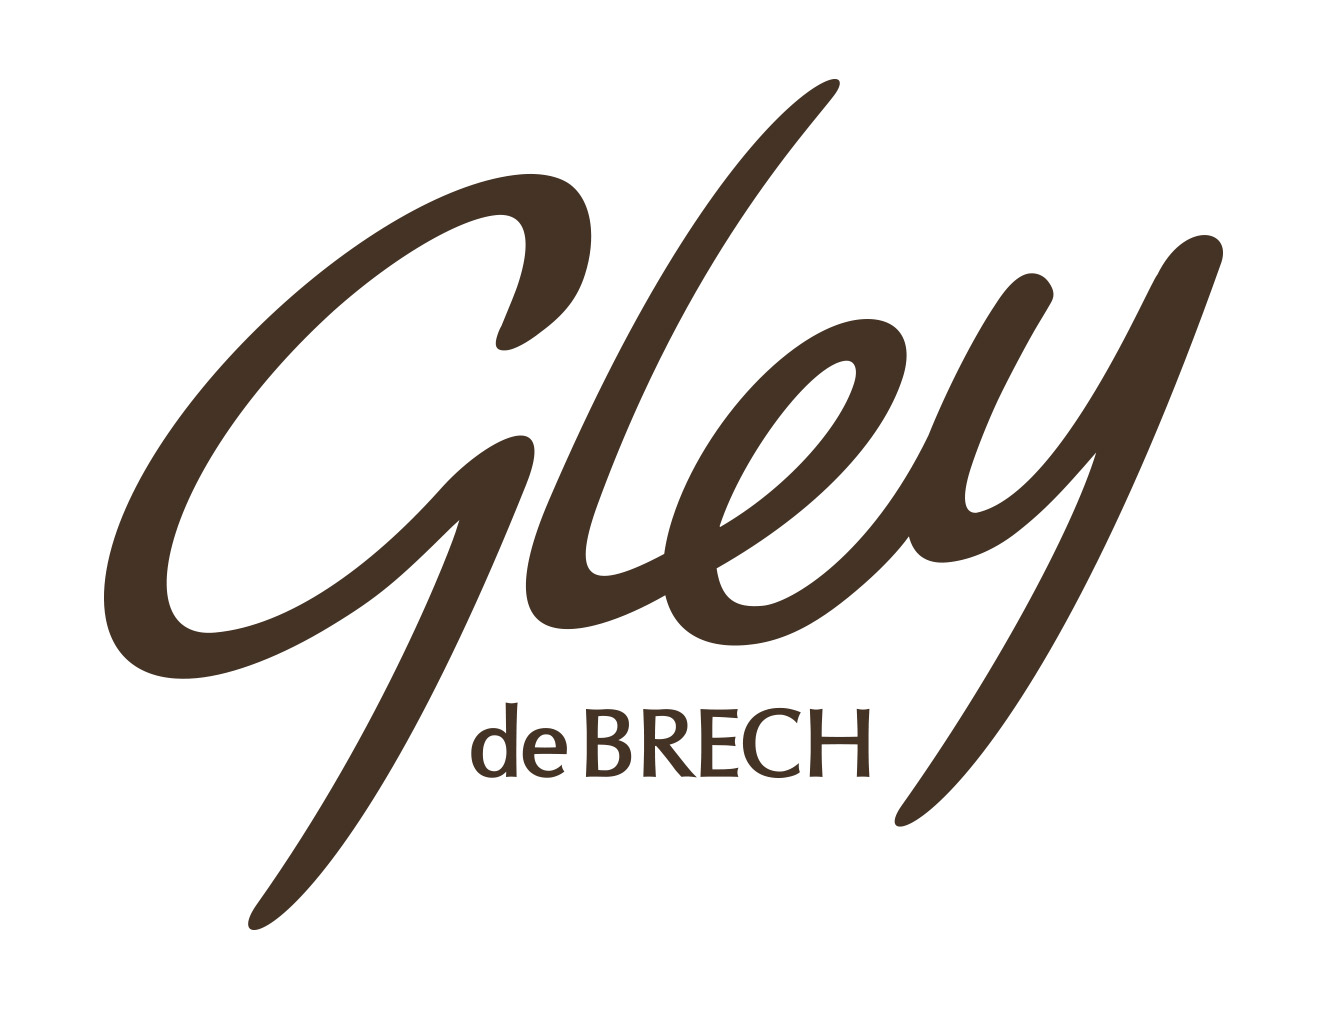 Logo-gley-de-brech-bioestetika